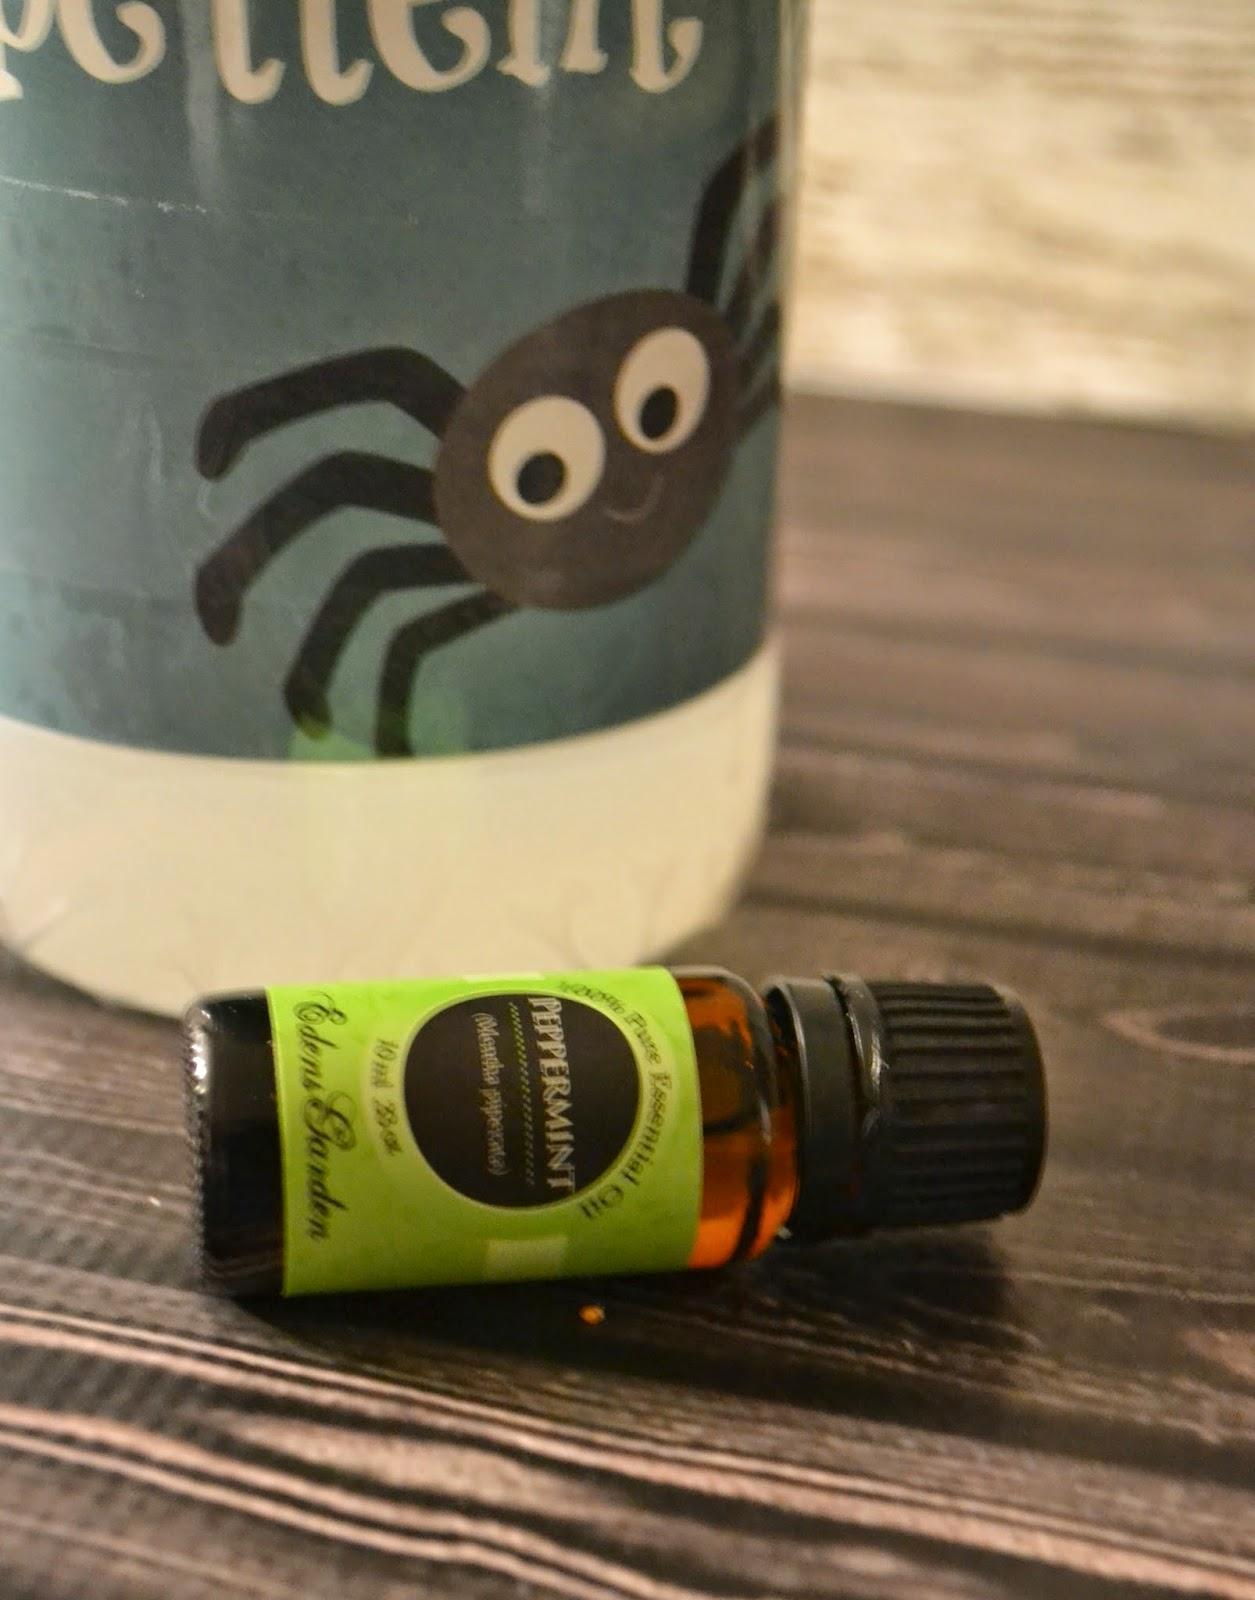 Homemade Spider Repellent #DIY.  DIY Spider Repellent.  Homemade Spider spray. Homemade Non-Toxic Spider Repellent #DIY.  All natural spider repellent.  All natural spider spray. Peppermint spider spray.  Peppermint oil uses.